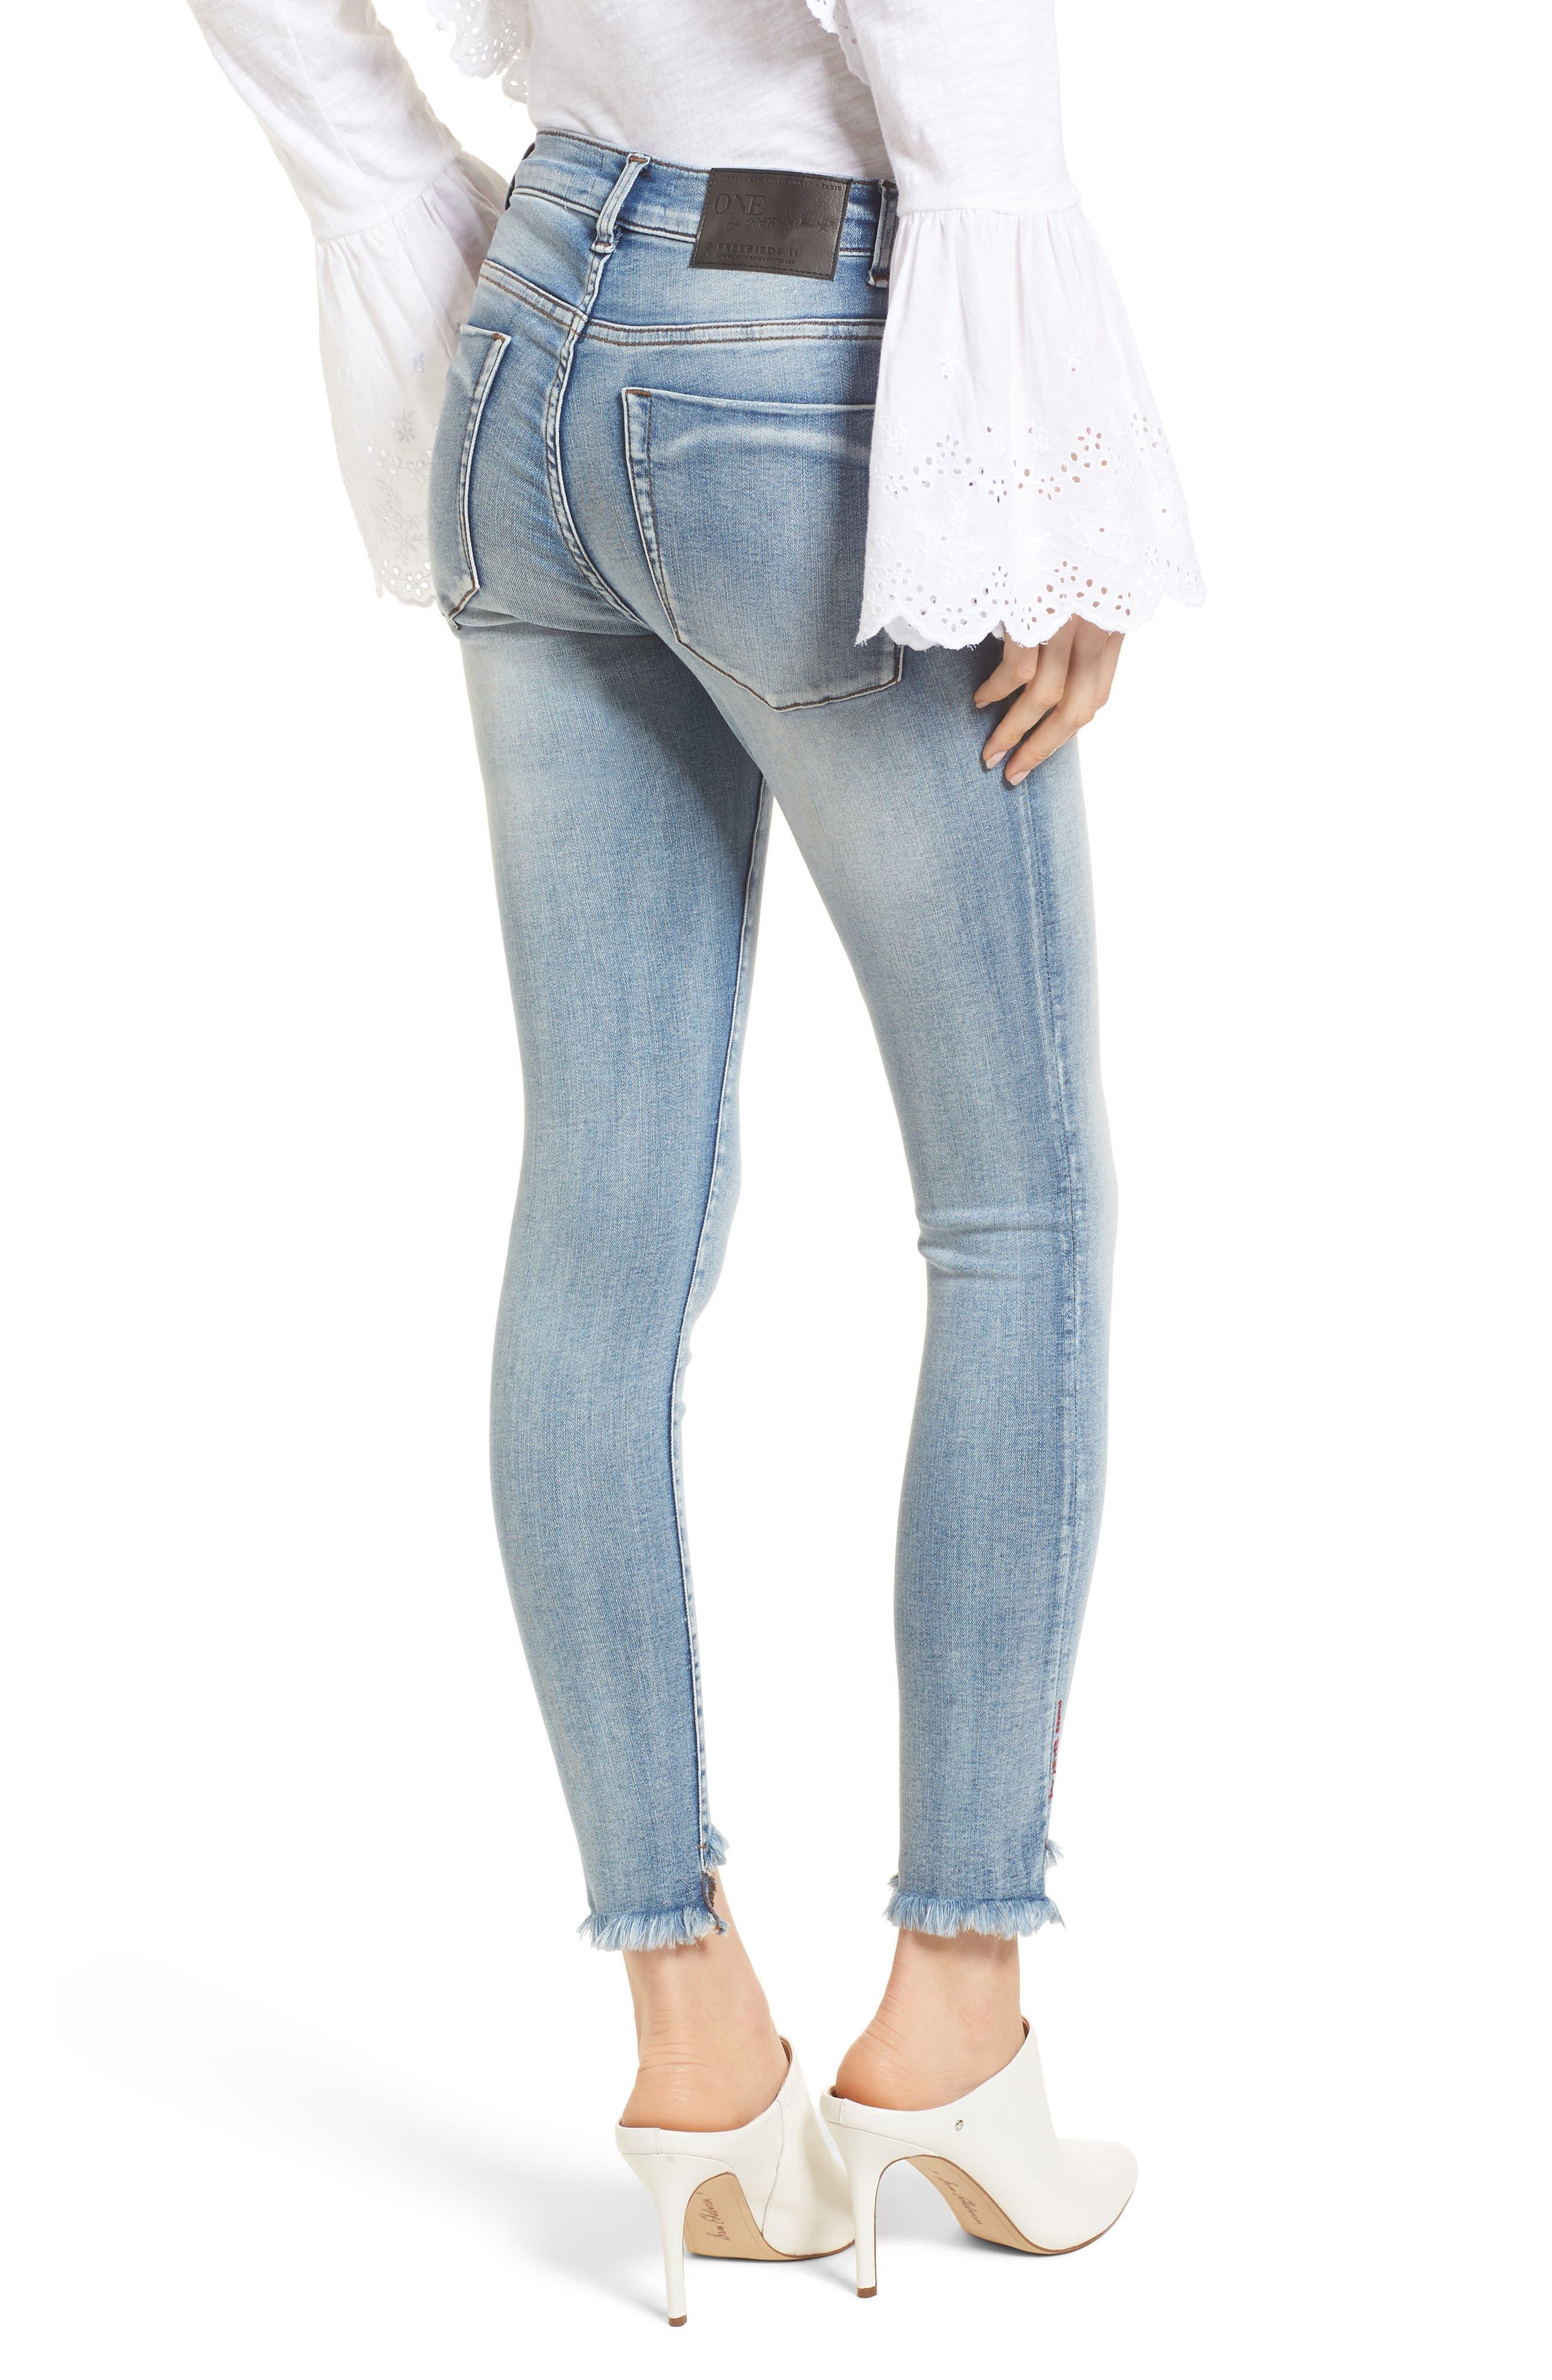 Freebirds Skinny Jeans,                             Alternate thumbnail 2, color,                             Cobaine